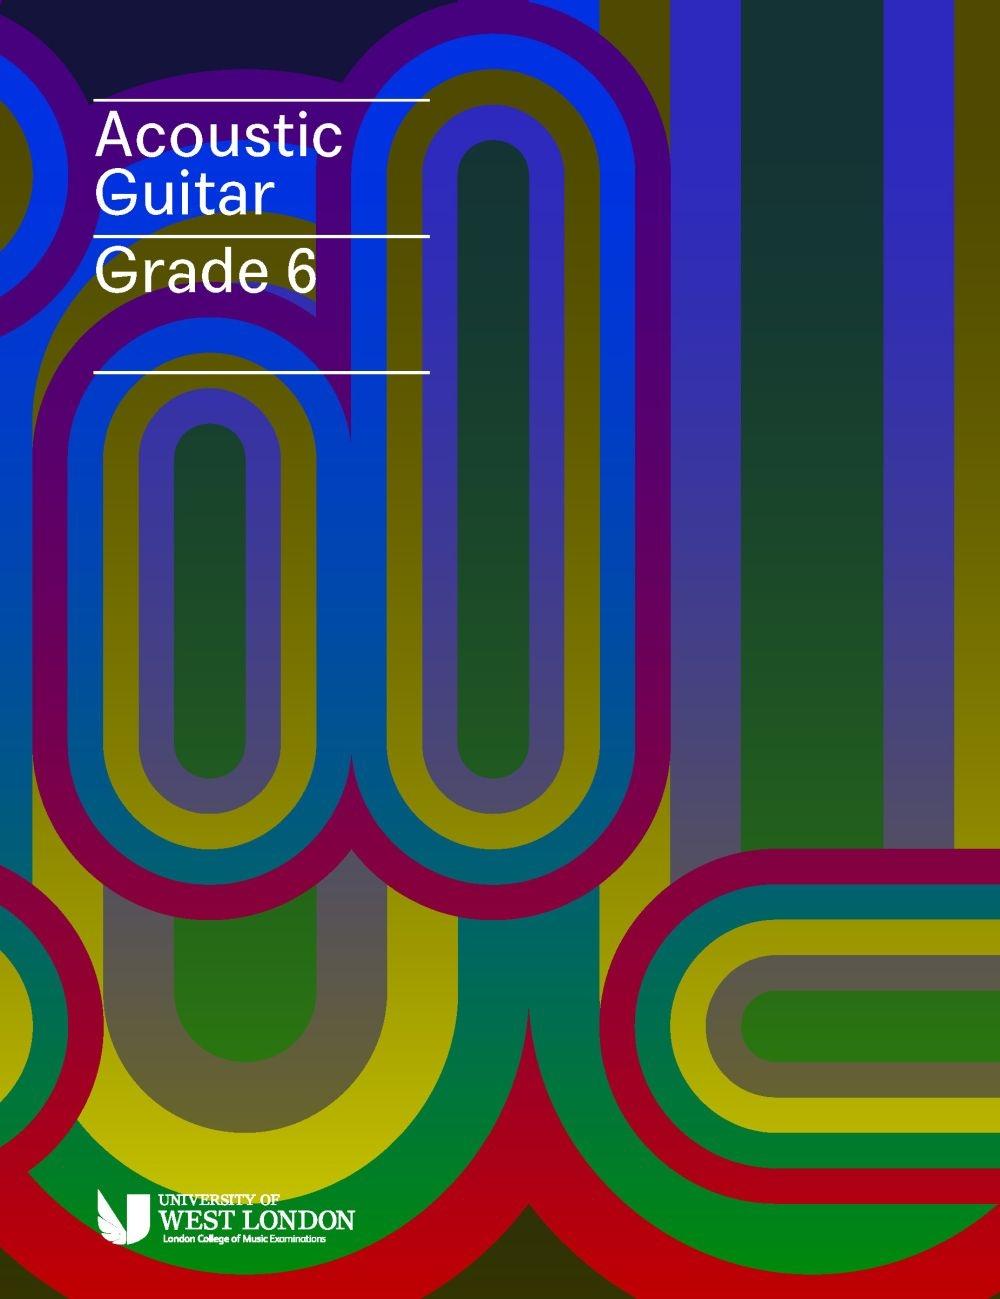 LCM Acoustic Guitar Handbook Grade 6 2020: Acoustic Guitar: Instrumental Tutor